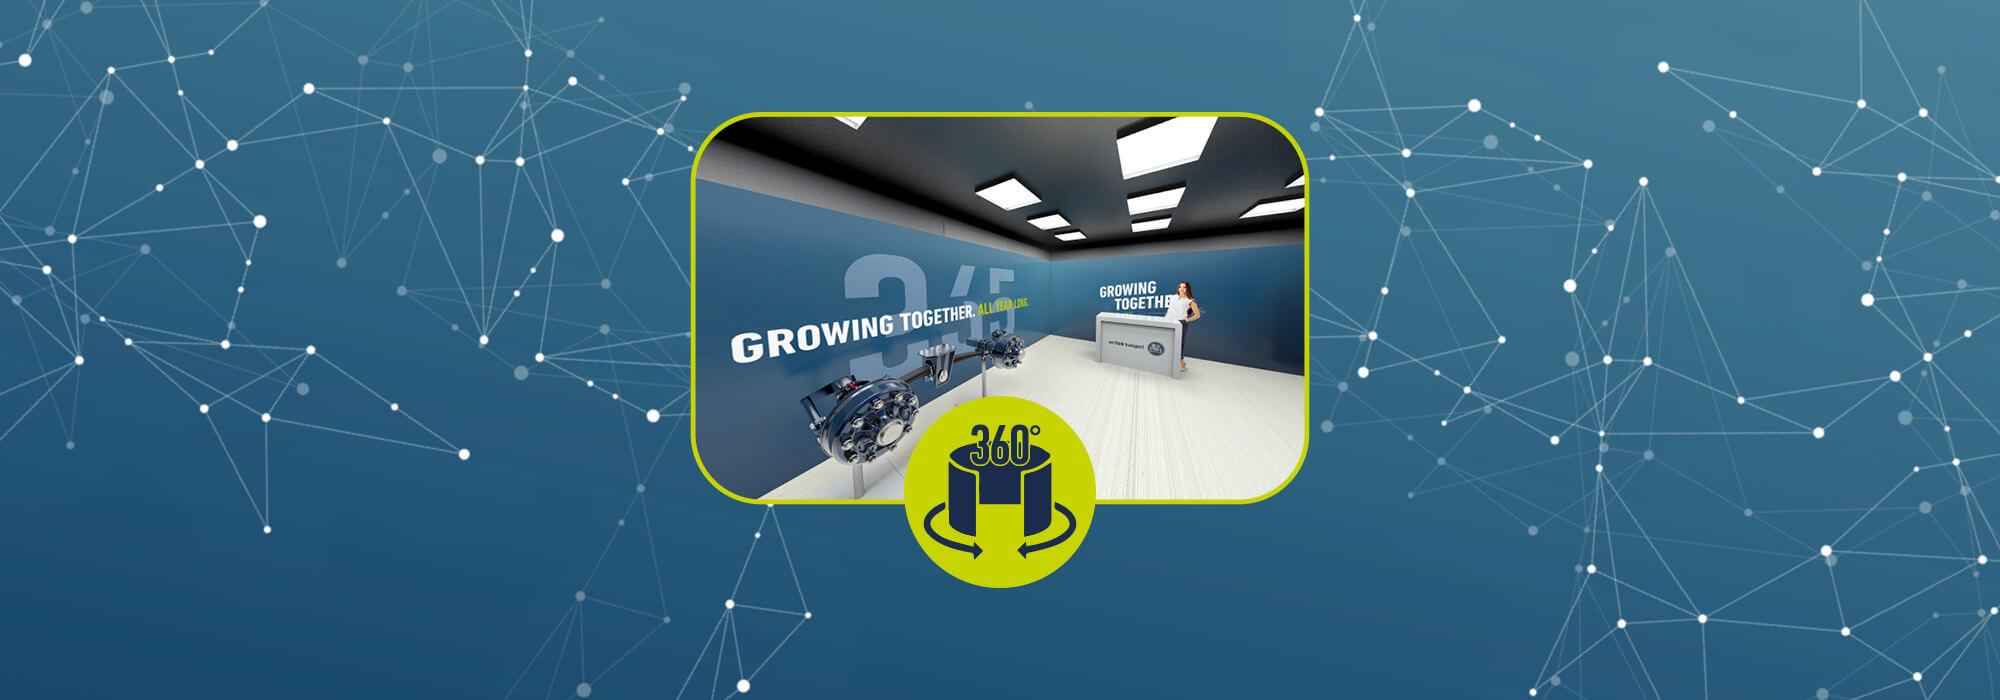 BPW virtuális túra - Nine Company